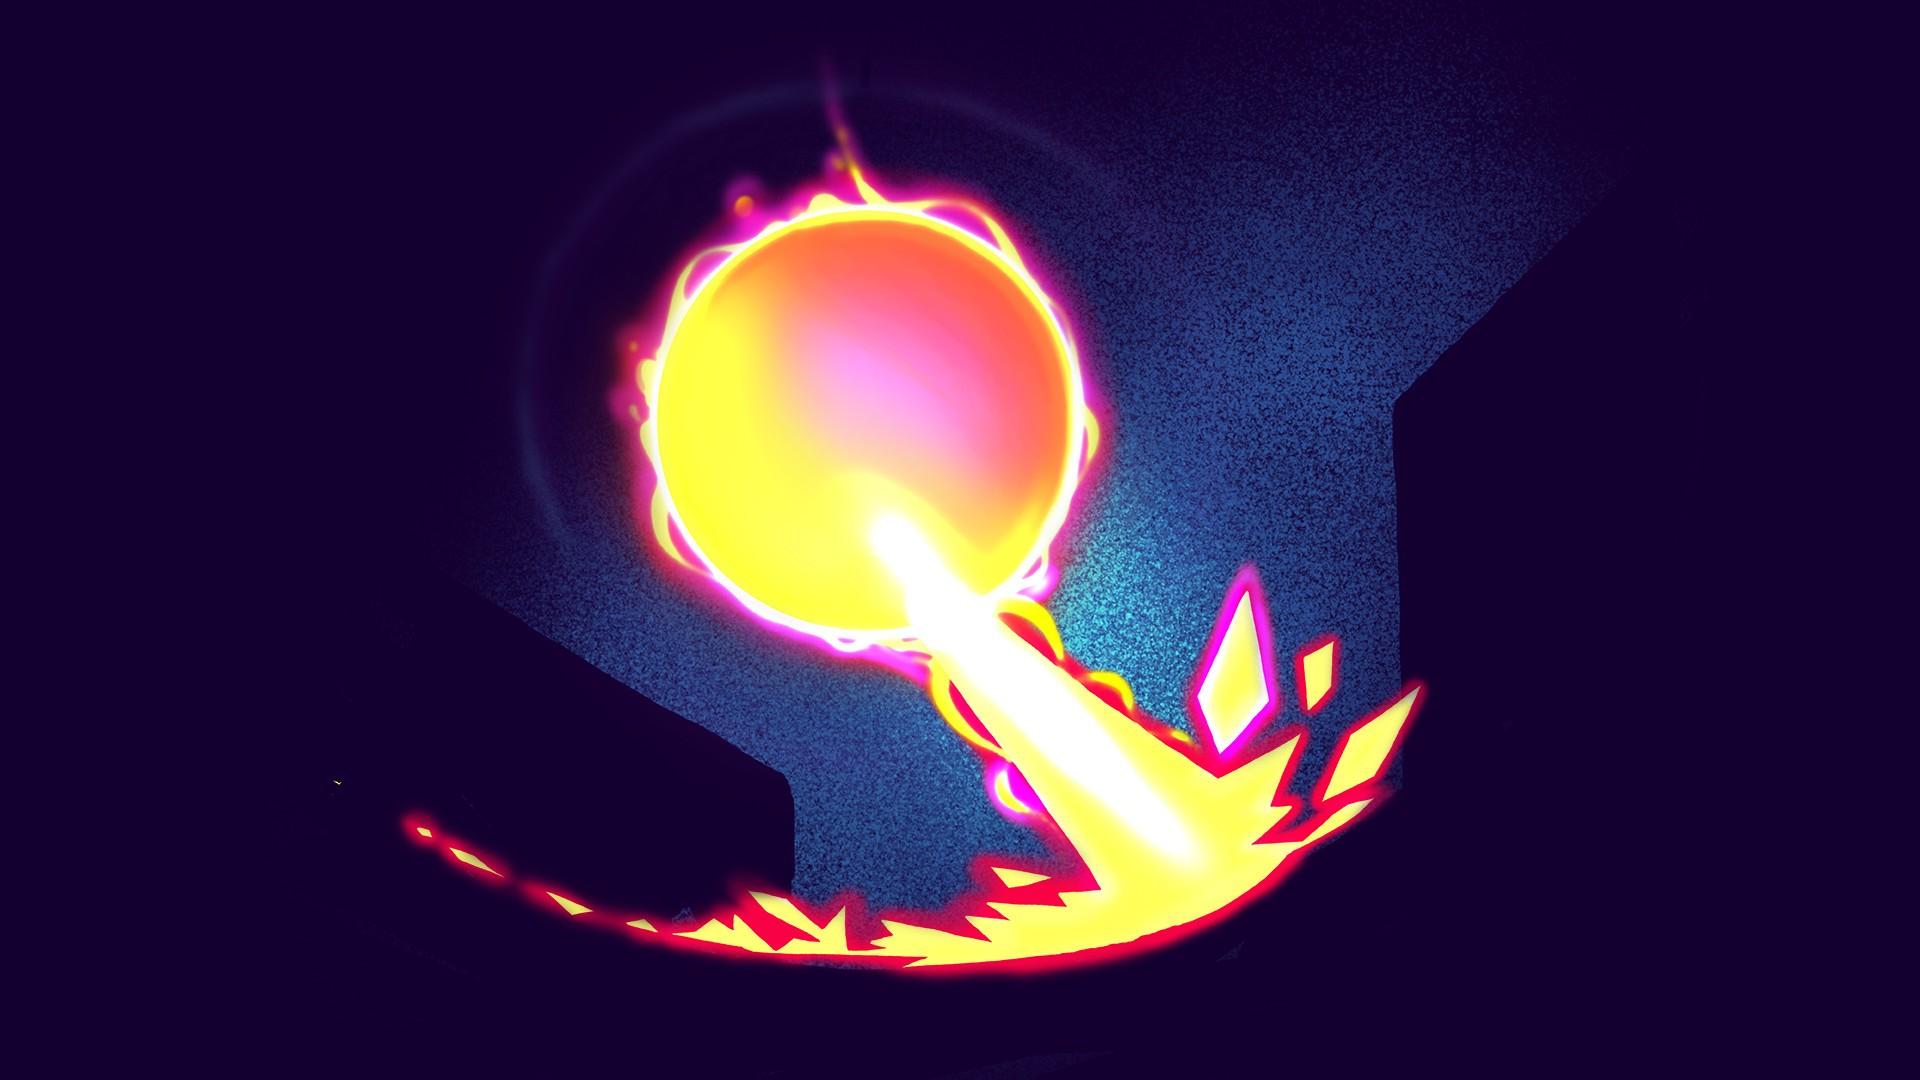 Wallpaper Digital Art Video Games Abstract Artwork Yellow Blue Fire Heat Ink Light Flame Darkness Graphics 1920x1080 Px Computer Wallpaper Font 1920x1080 Coolwallpapers 775233 Hd Wallpapers Wallhere